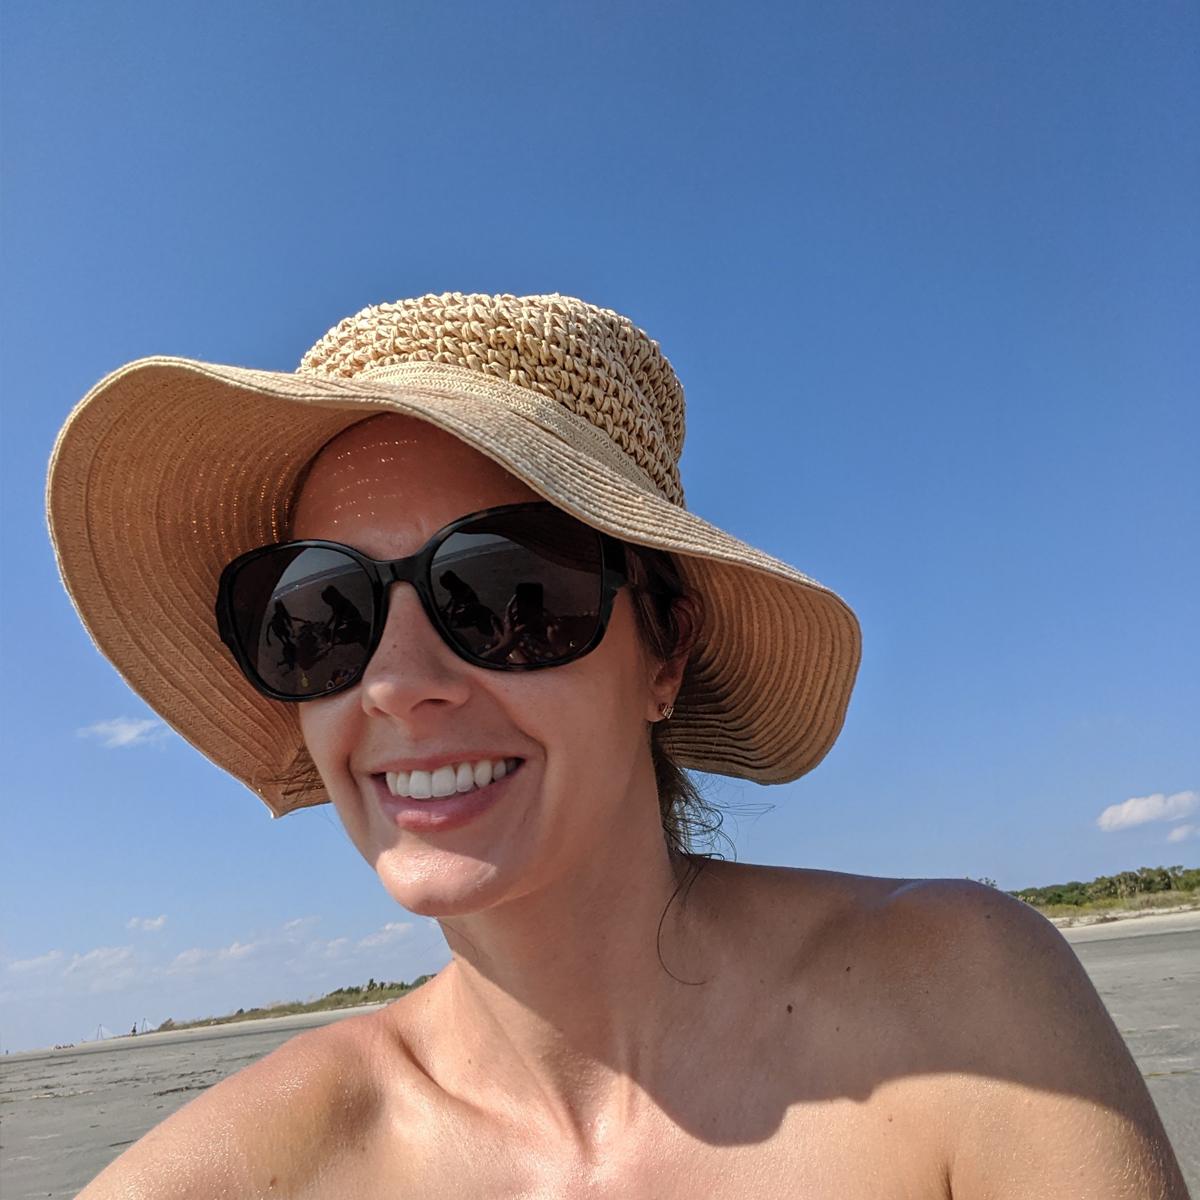 Skimble Trainer Casondra Leblanc enjoying some exercise at the beach